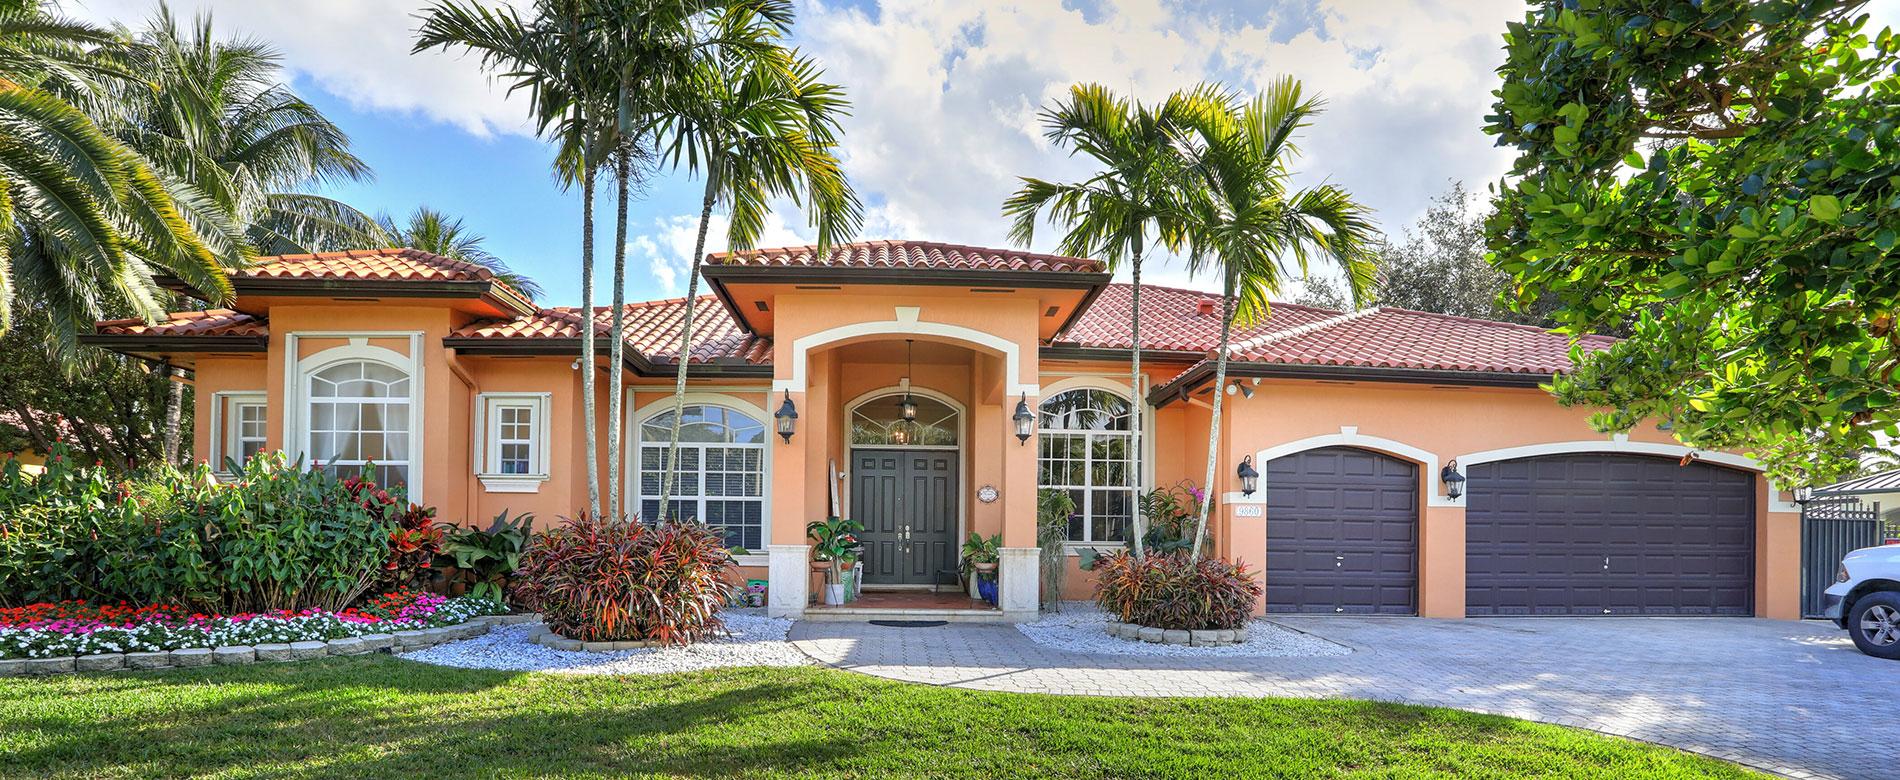 Miami Luxury Top Realtor